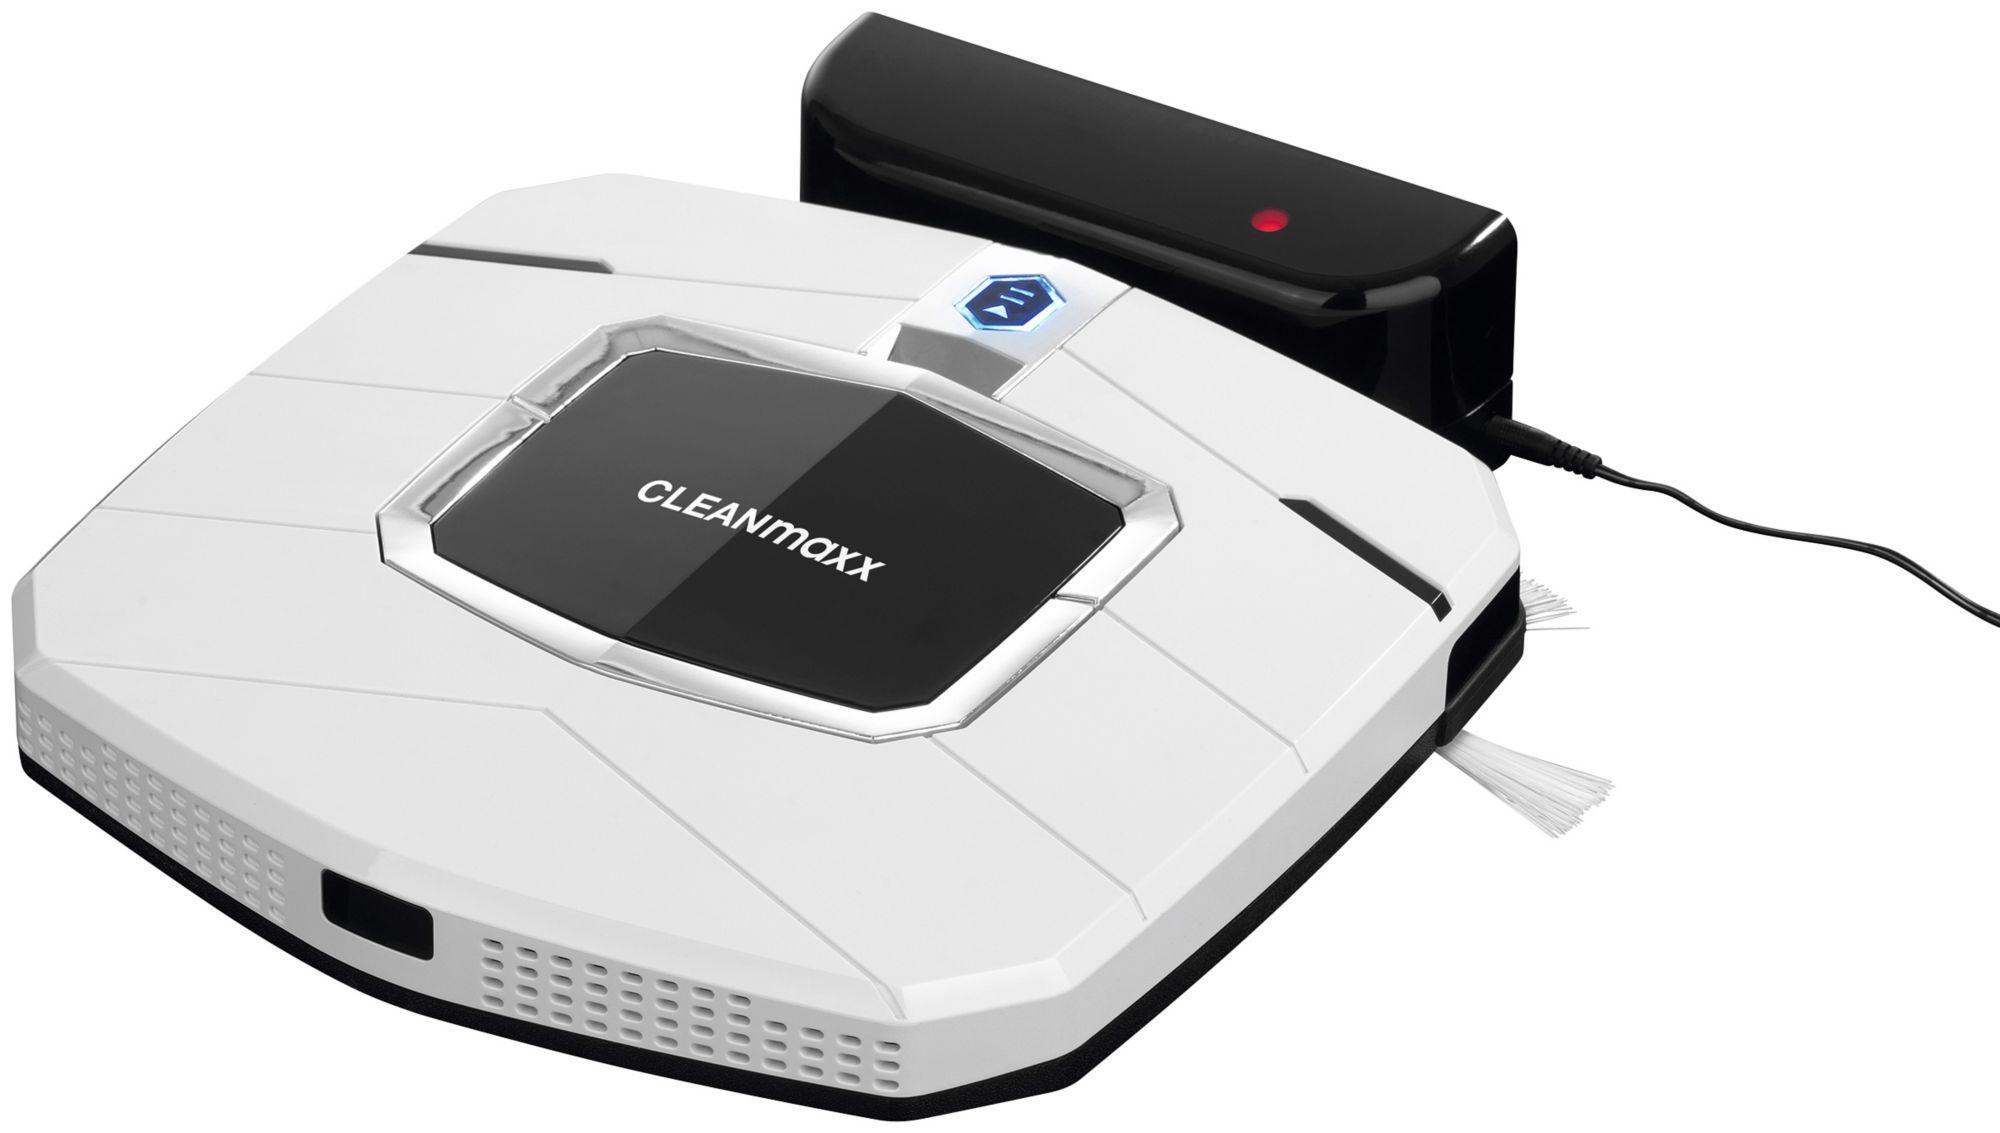 CLEAN MAXX CLEANmaxx Saugroboter »cleanmaxx Slim Design«